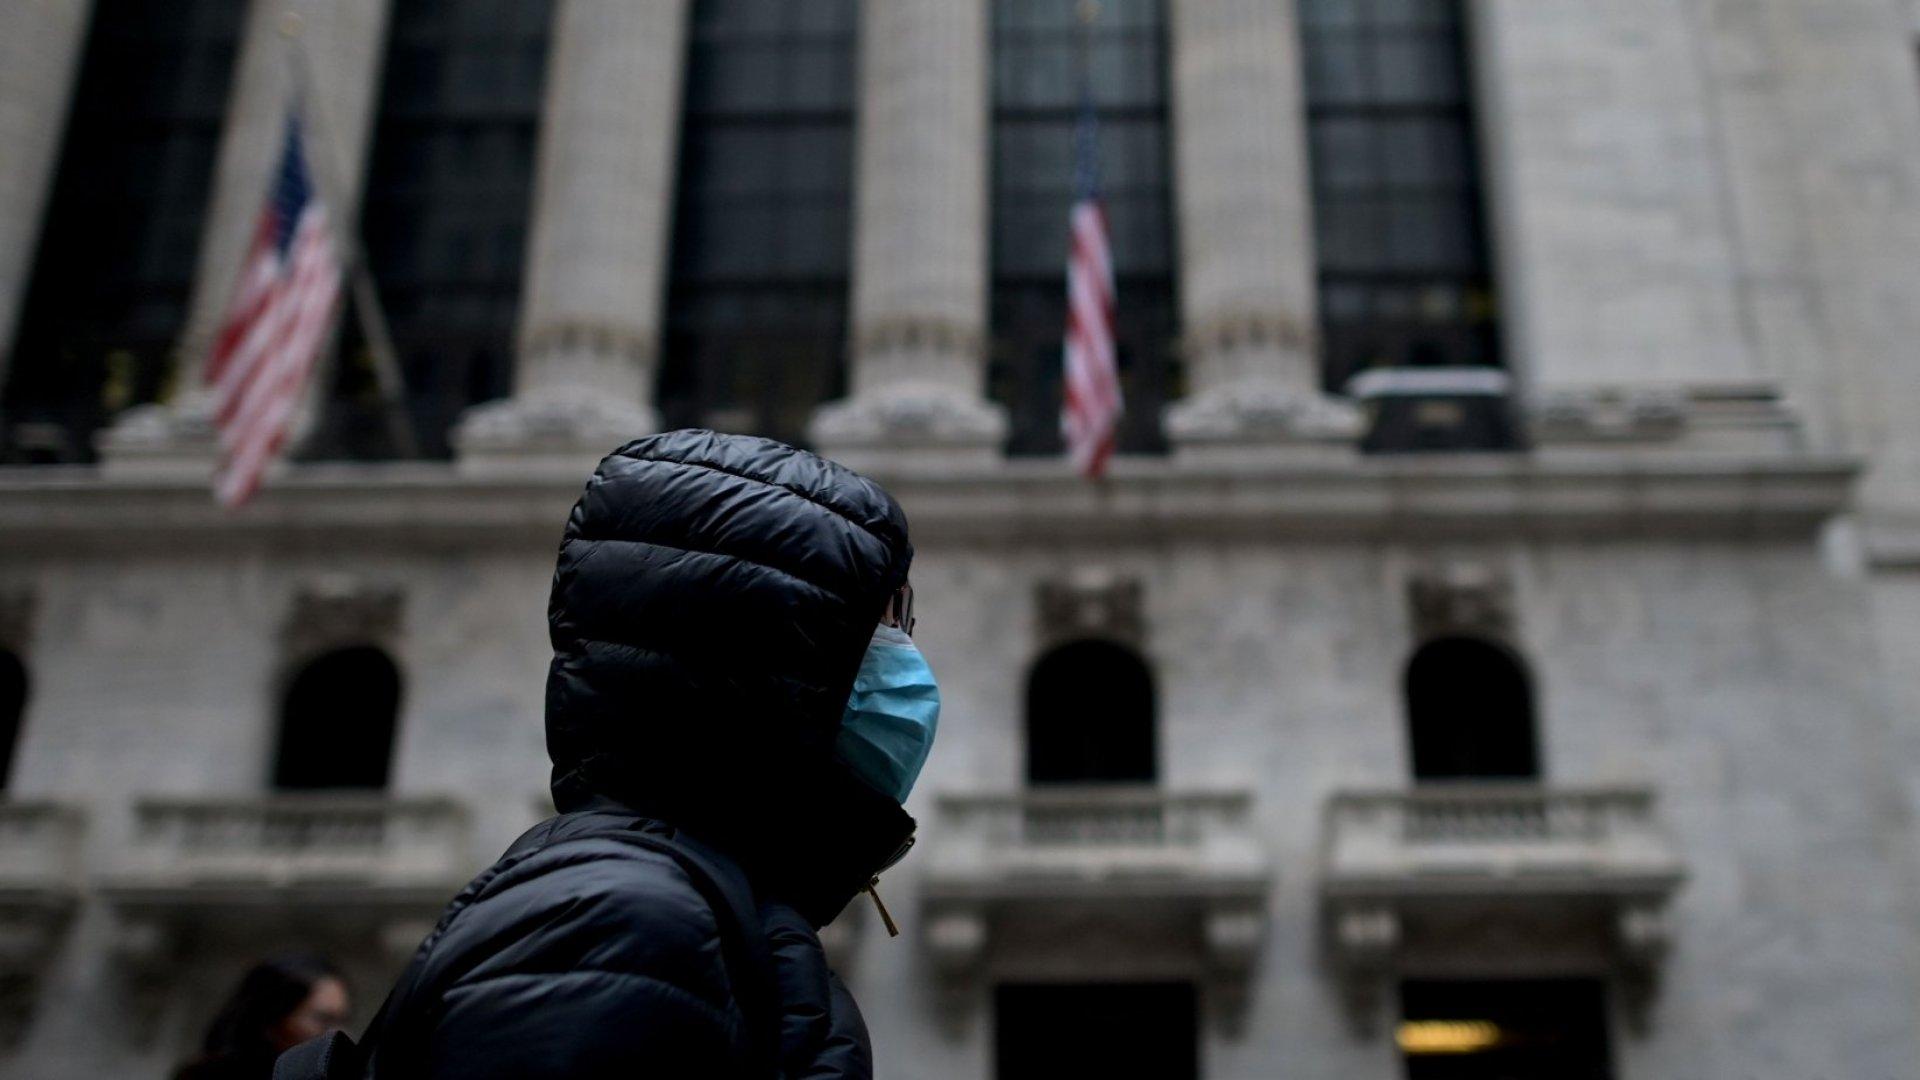 U.S. Added a Robust 273,000 Jobs in February Before Coronavirus Concerns Escalated